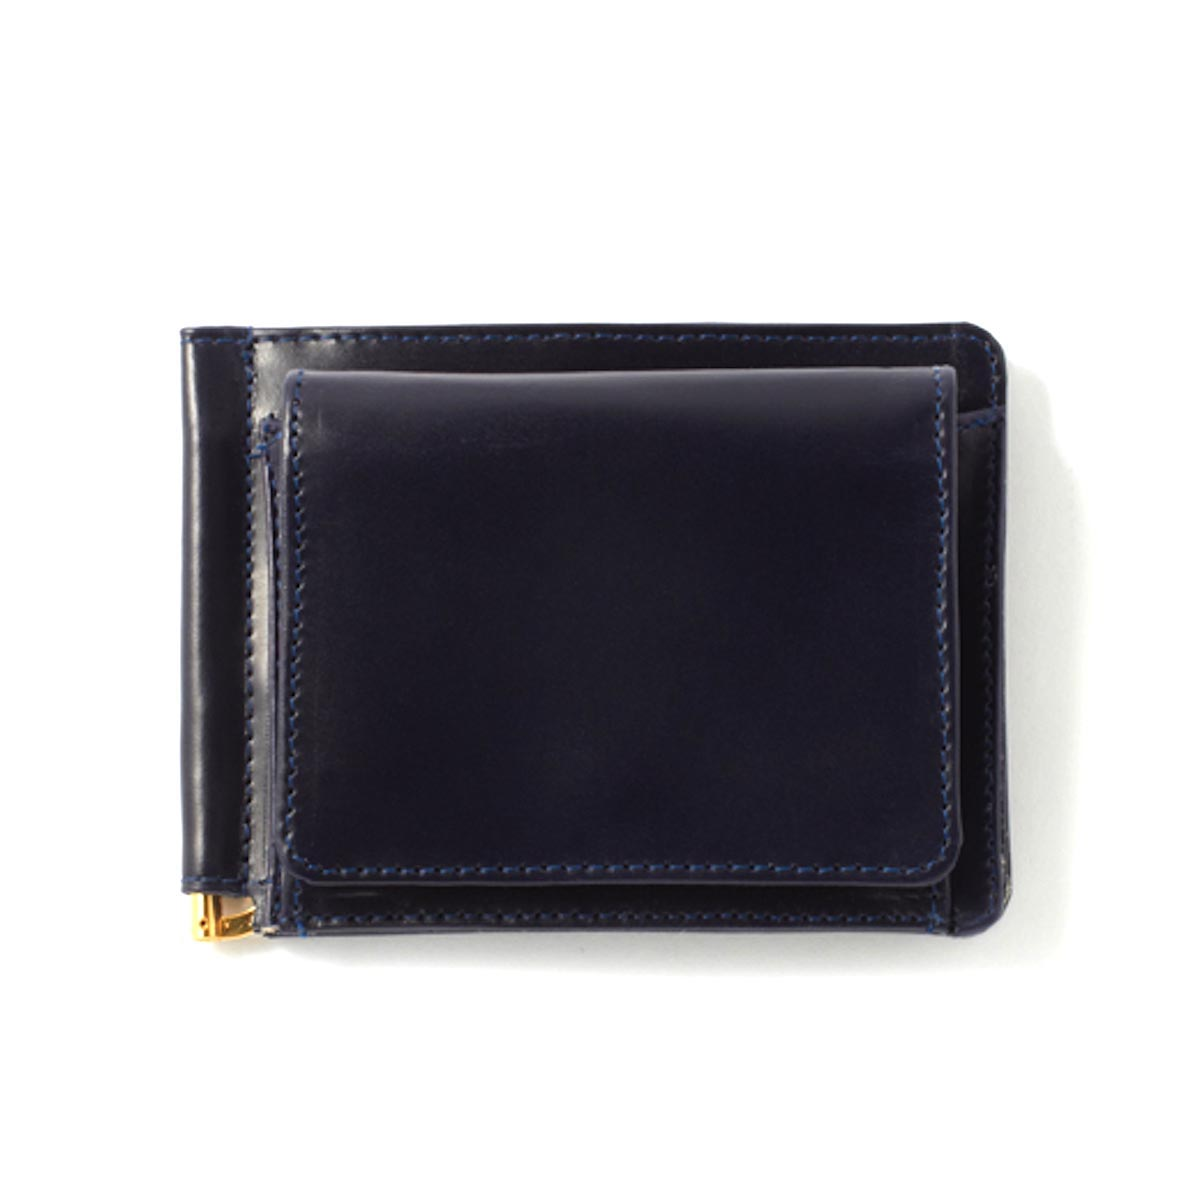 GLENROYAL / MONEY CLIP WITH COIN POCKET -DARK BLUE